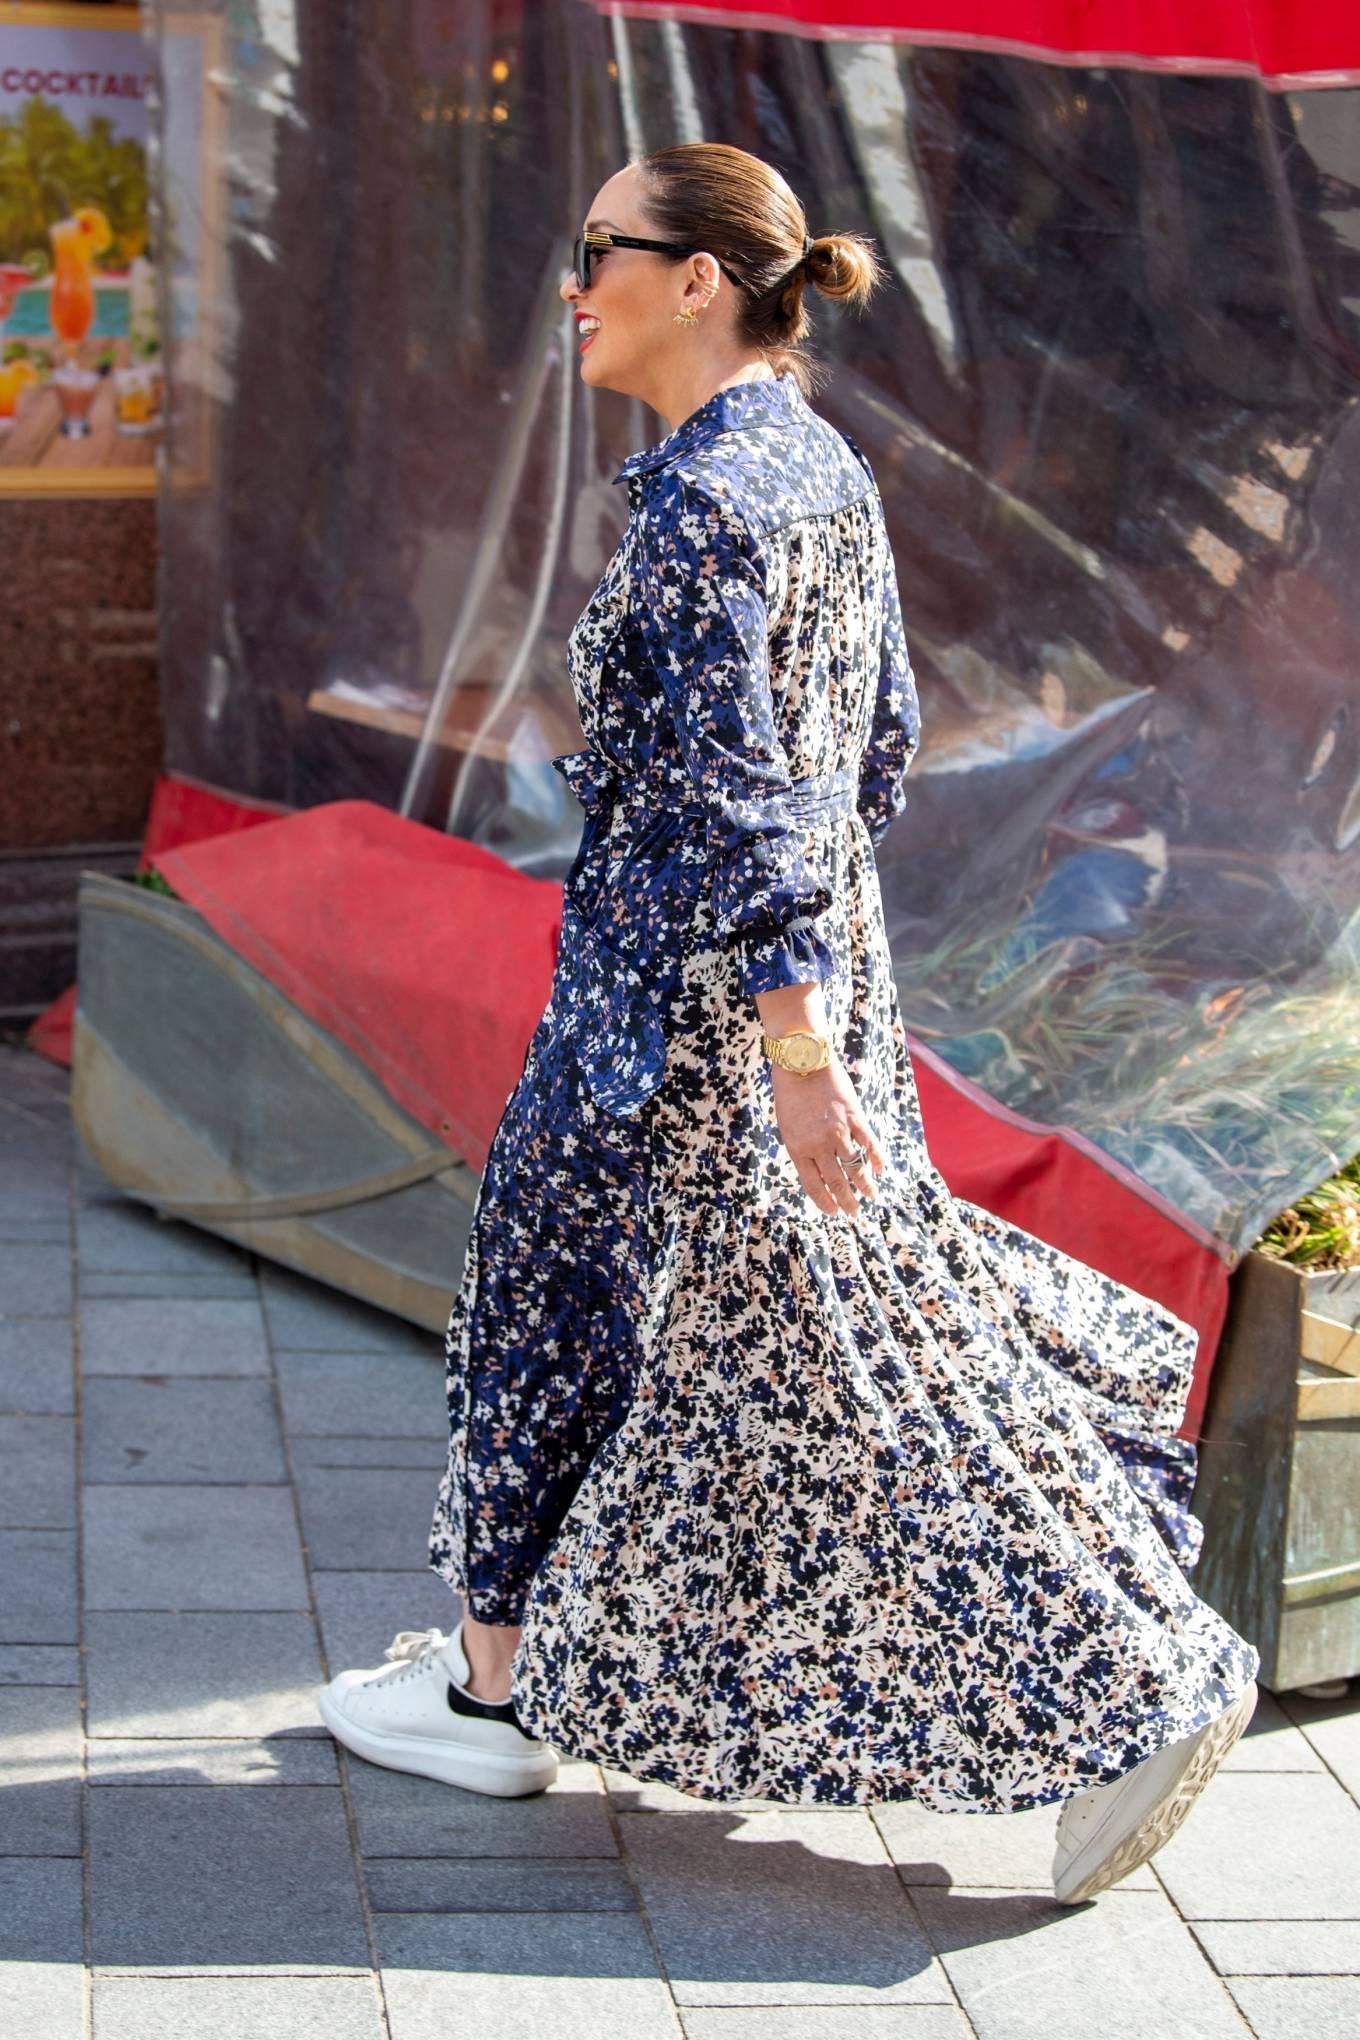 Myleene Klass 2021 : Myleene Klass – In a long summer dress arriving at the Global studios -02